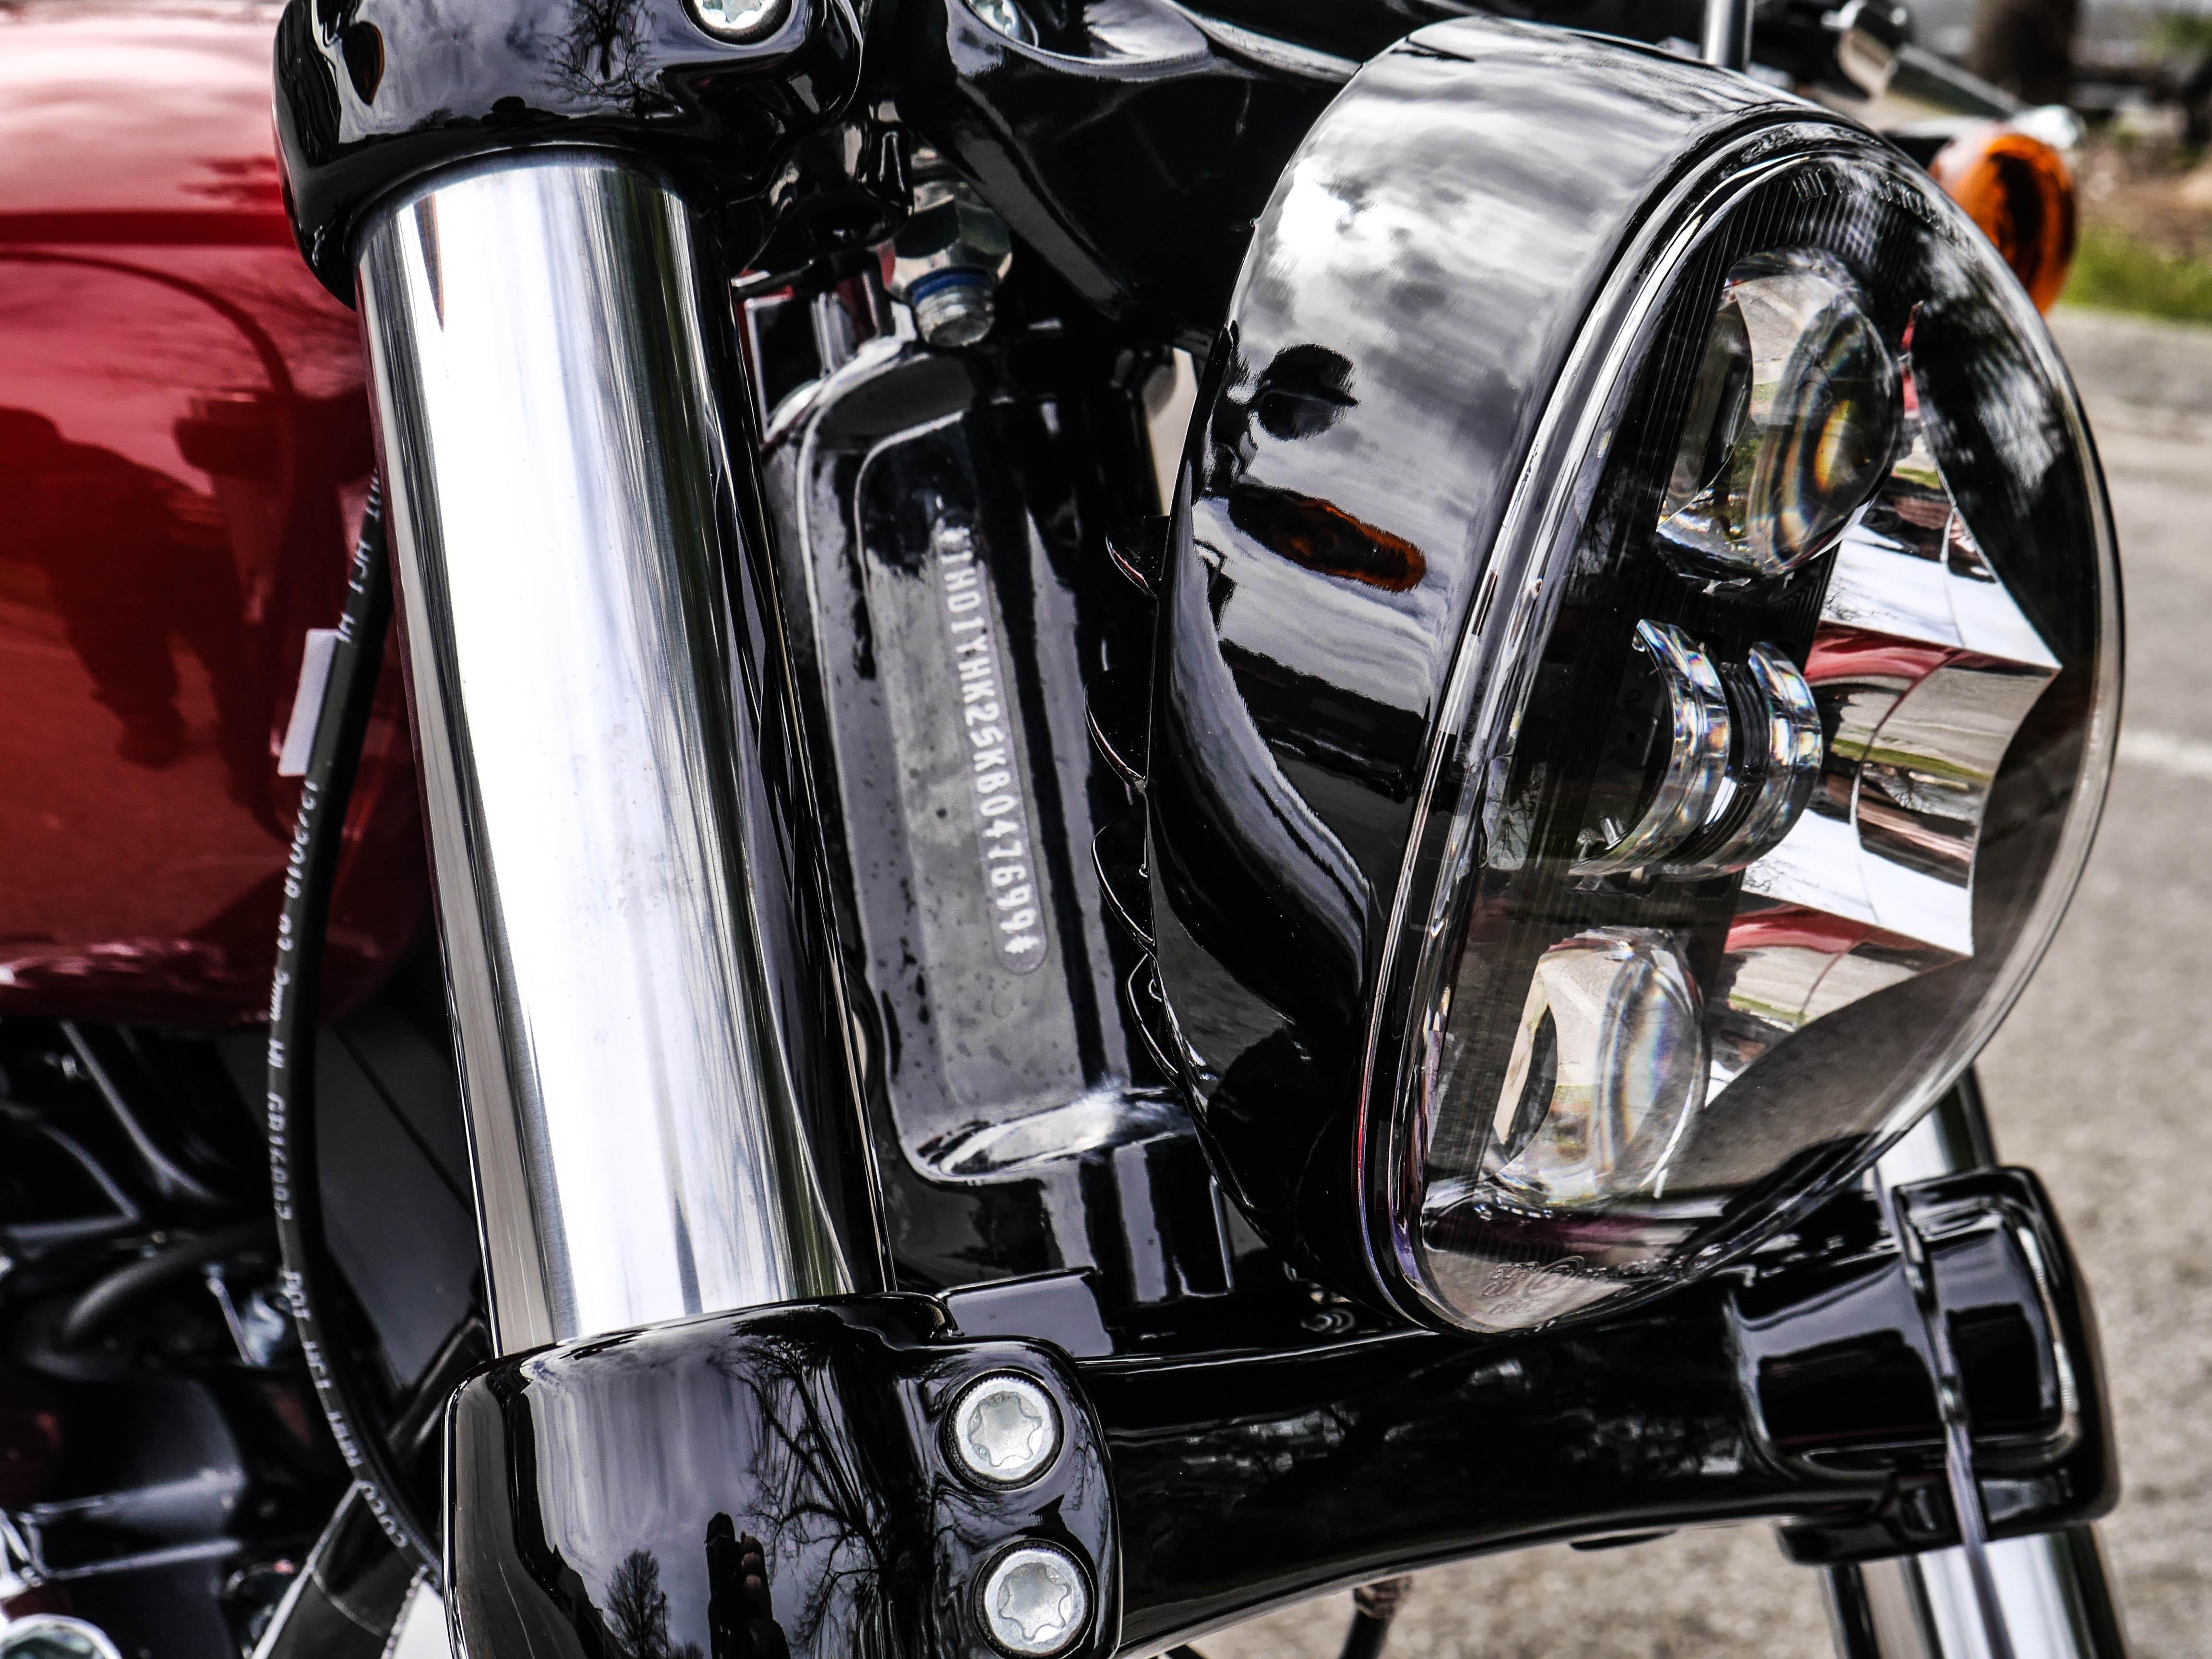 New 2019 Harley-Davidson Breakout 114 in Franklin #T047699